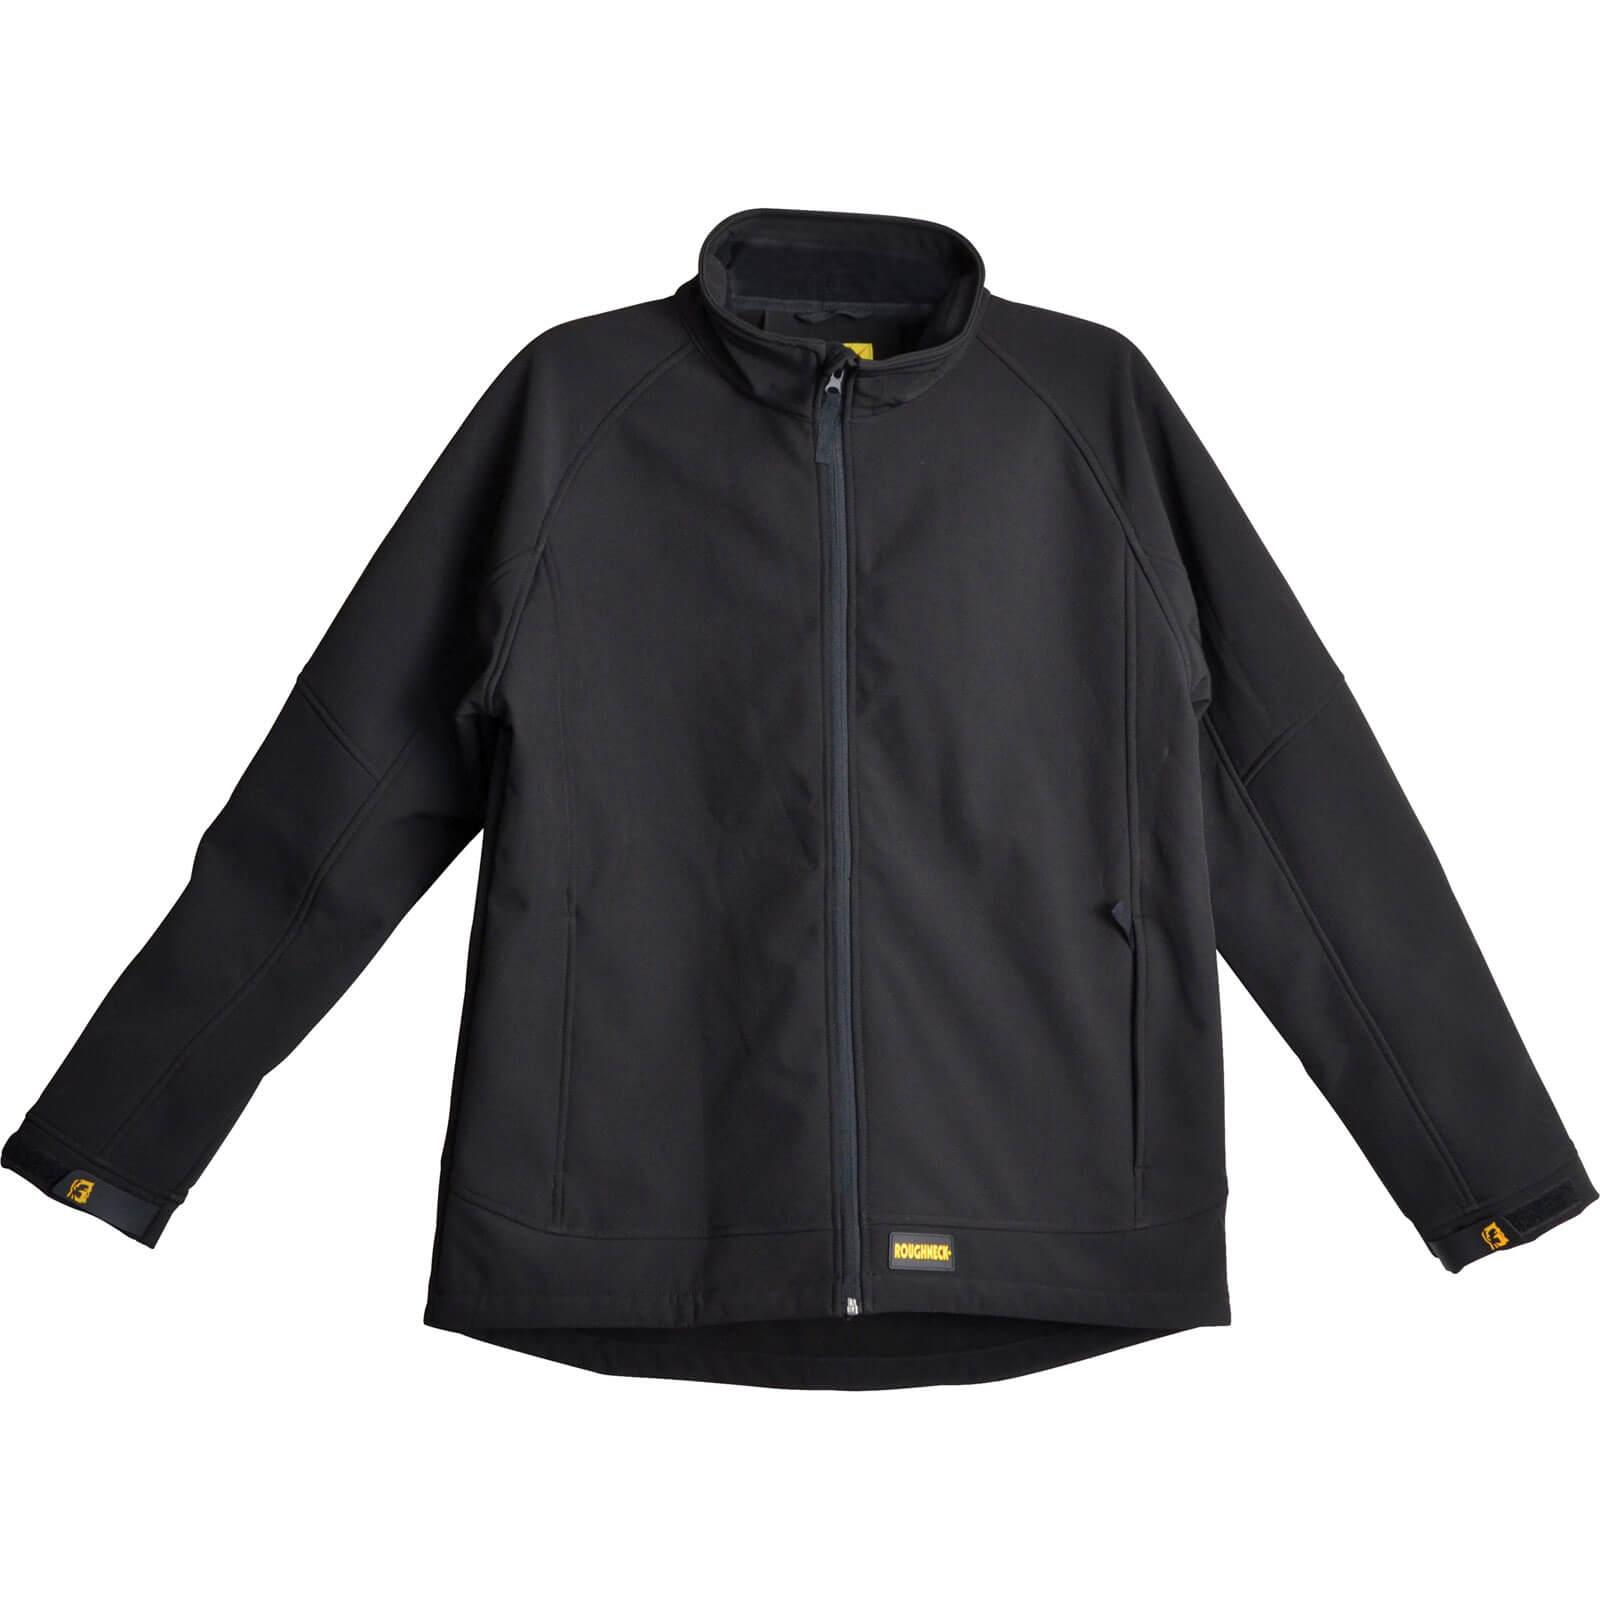 Roughneck Mens Soft Shell Jacket Black 2XL